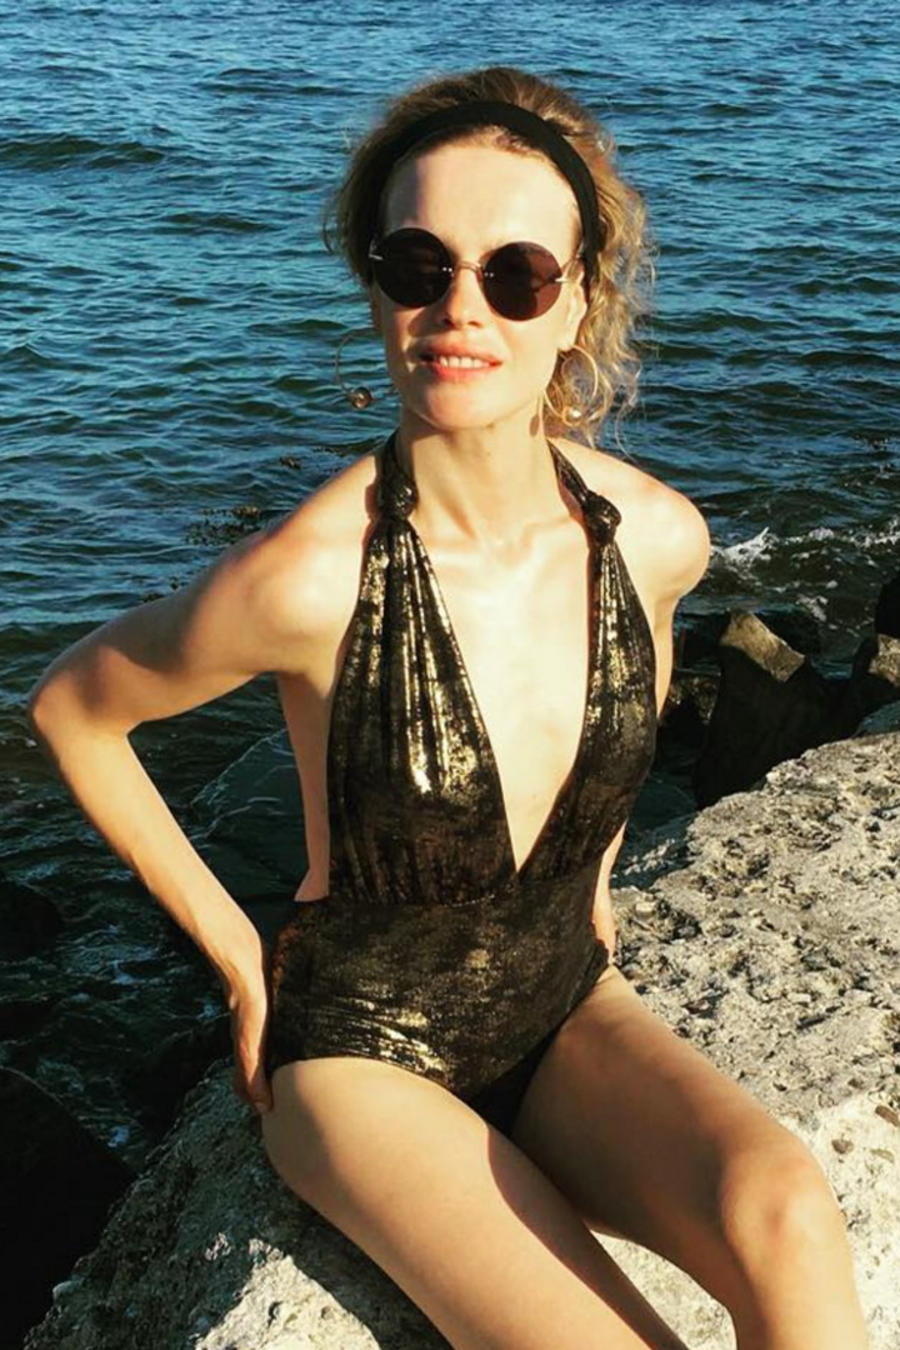 Natalia Vodianova en dos fotos con distintos pesos